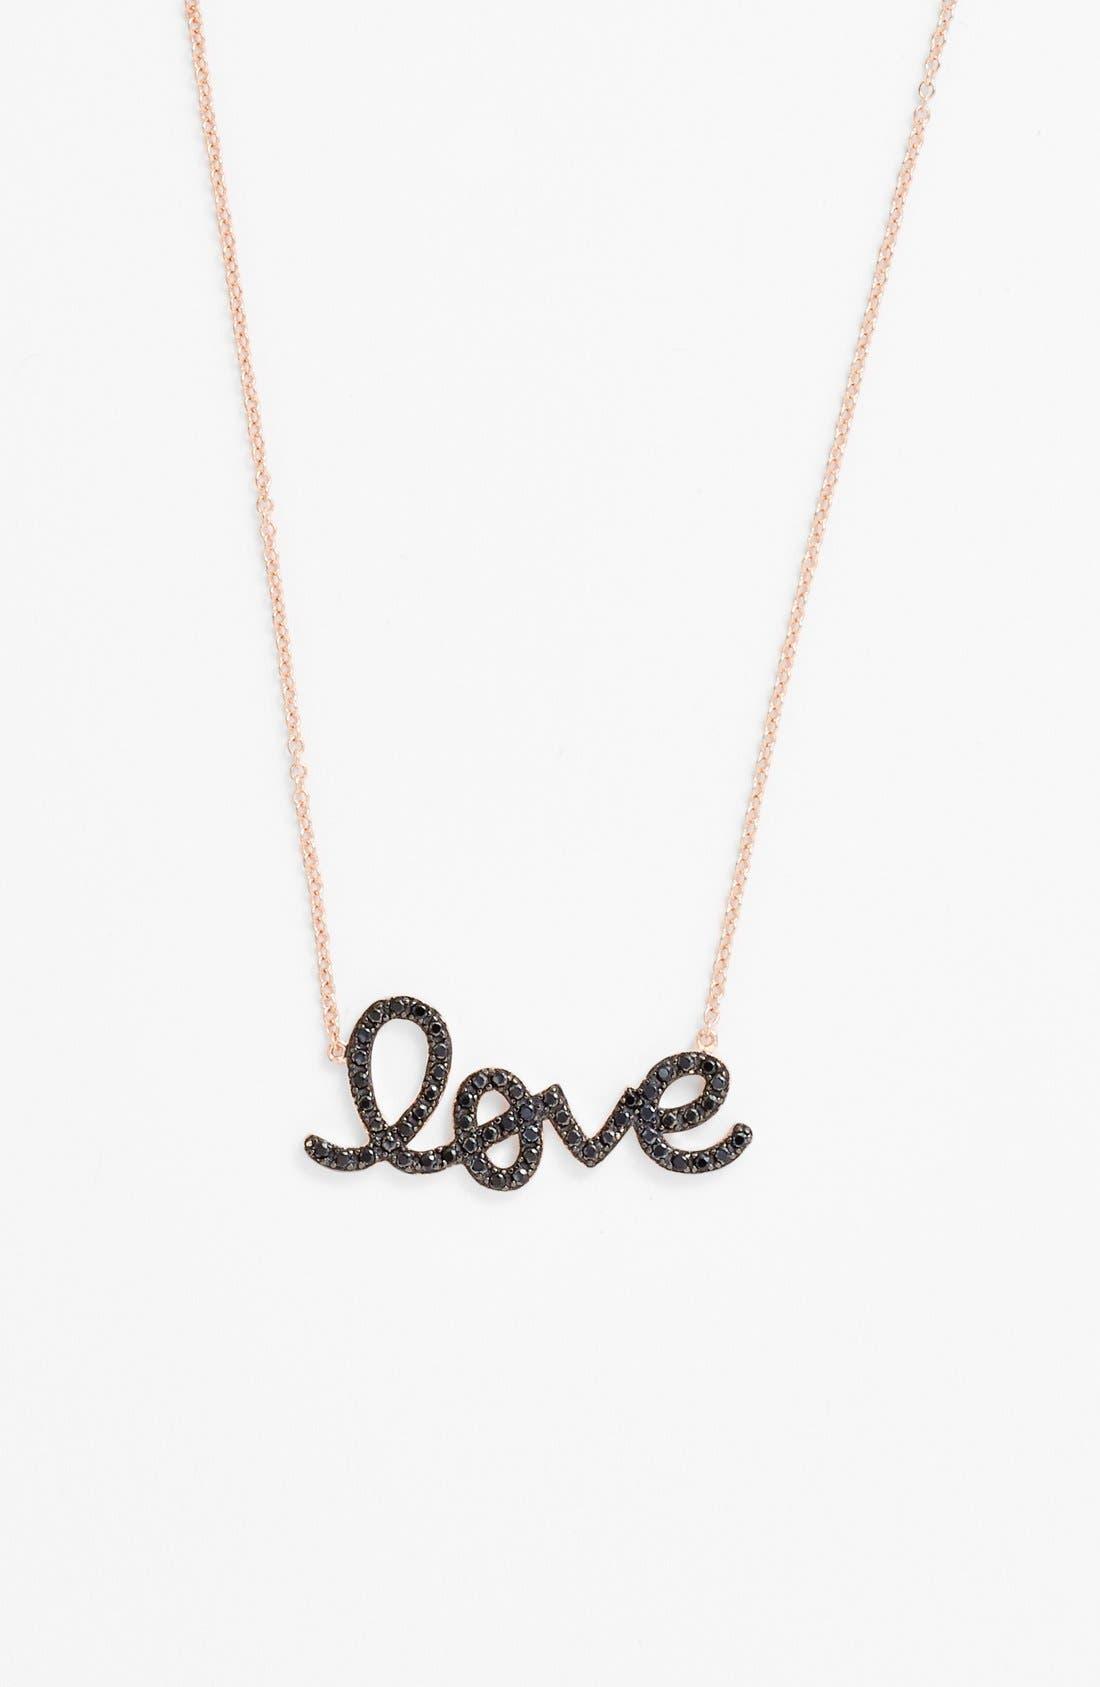 Main Image - Sugar Bean Jewelry 'Love' Pendant Necklace